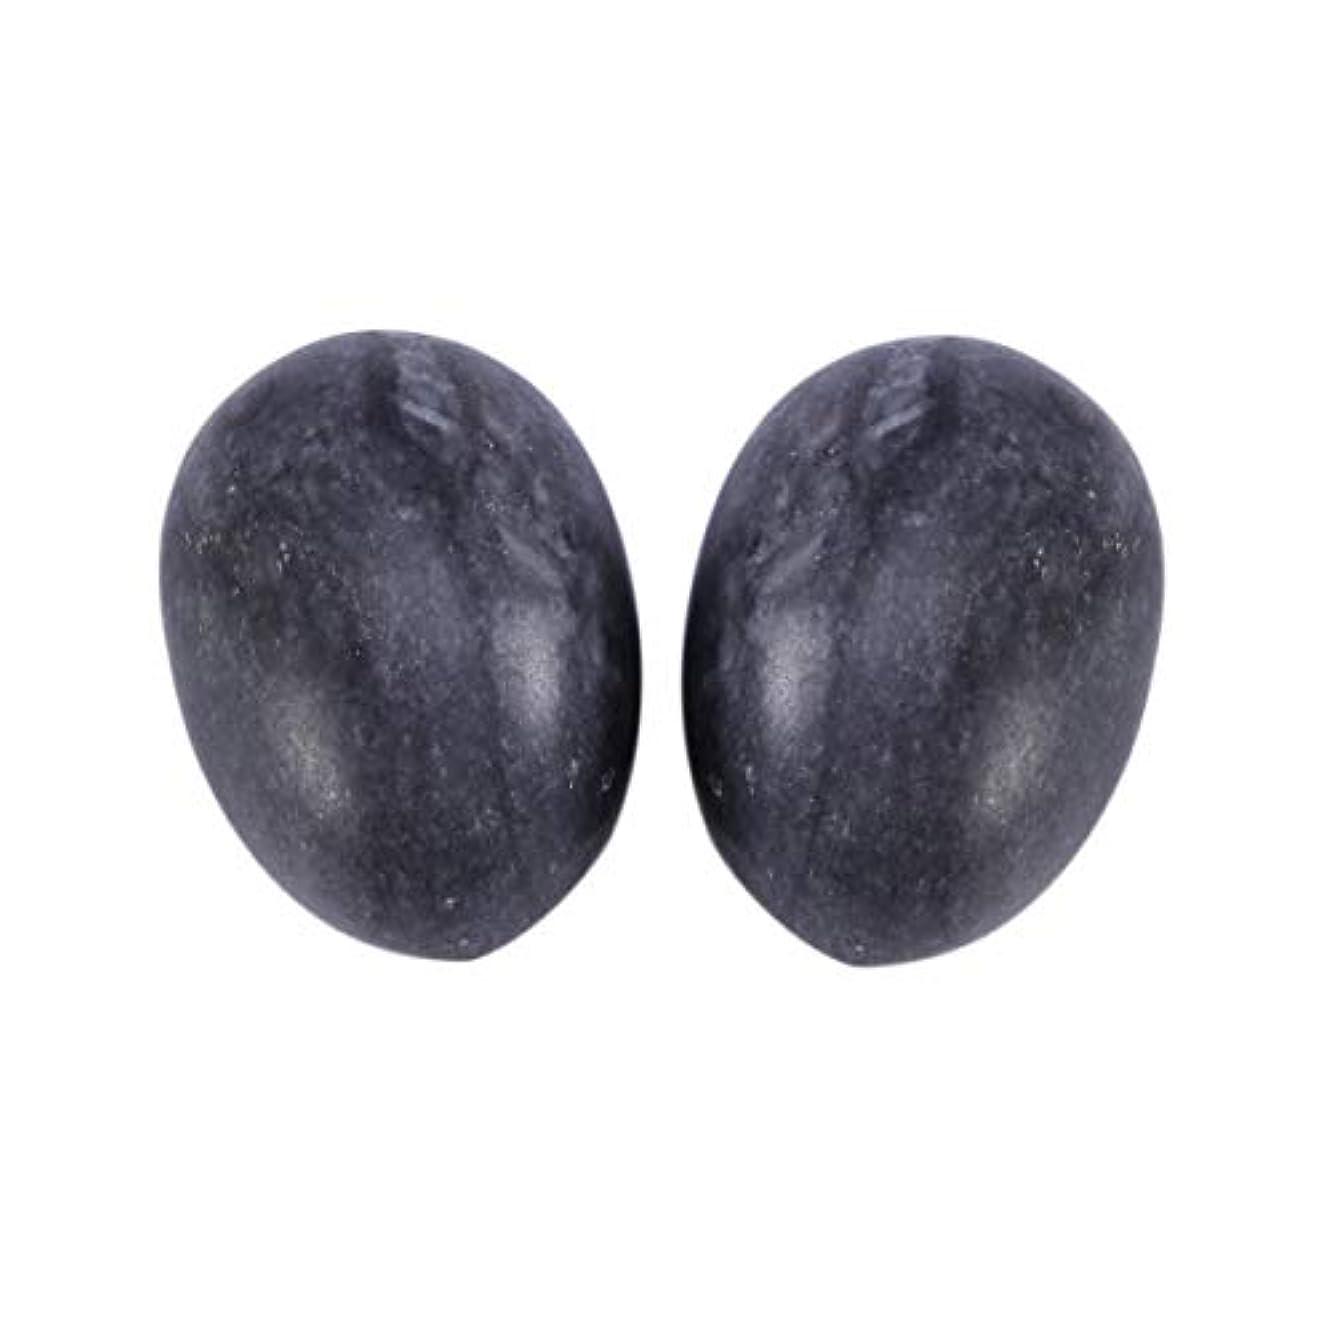 Healifty 6PCS翡翠Yoni卵マッサージ癒しの石のケゲル運動骨盤底筋運動(黒)